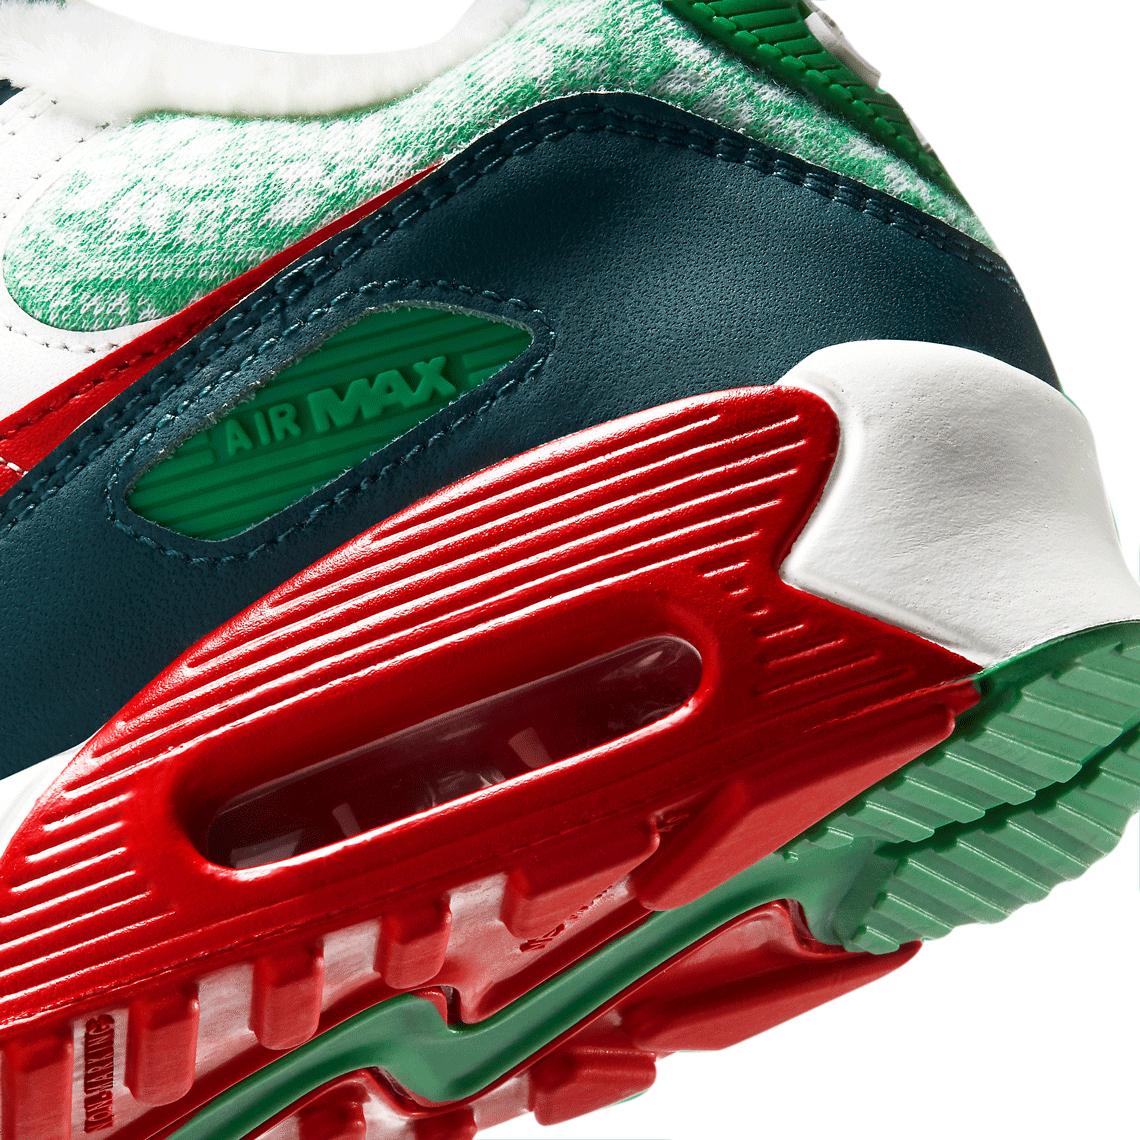 BUY Nike Air Max 90 Christmas Sweater 2020 | Kixify Marketplace